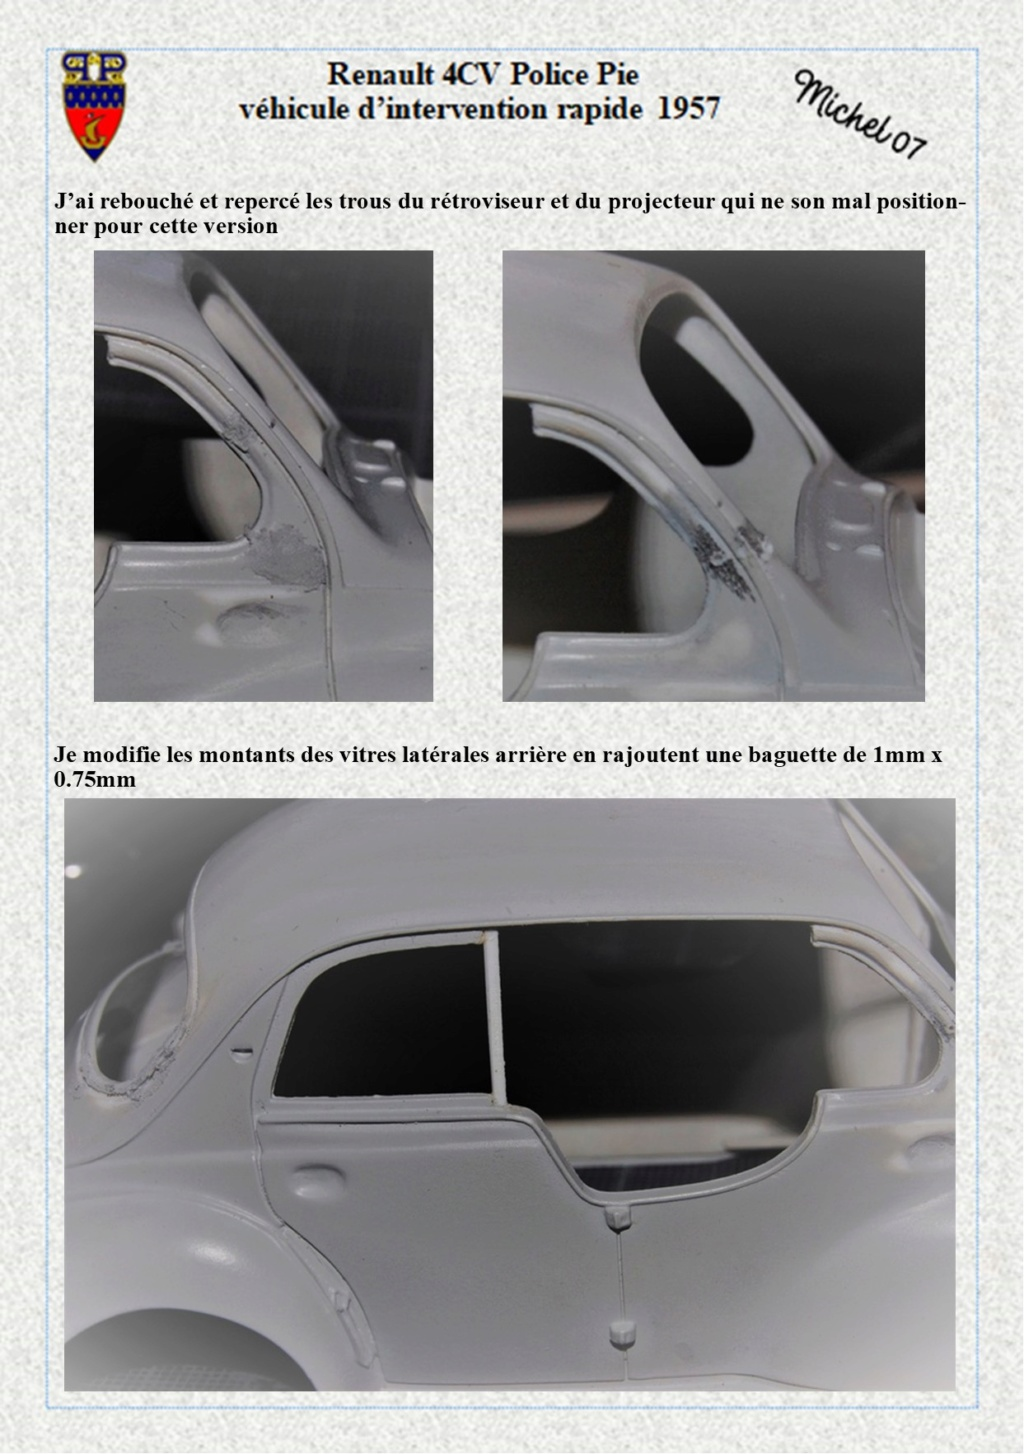 renault 4 cv pie 1957 Heller 1/24 (Terminé) Image137